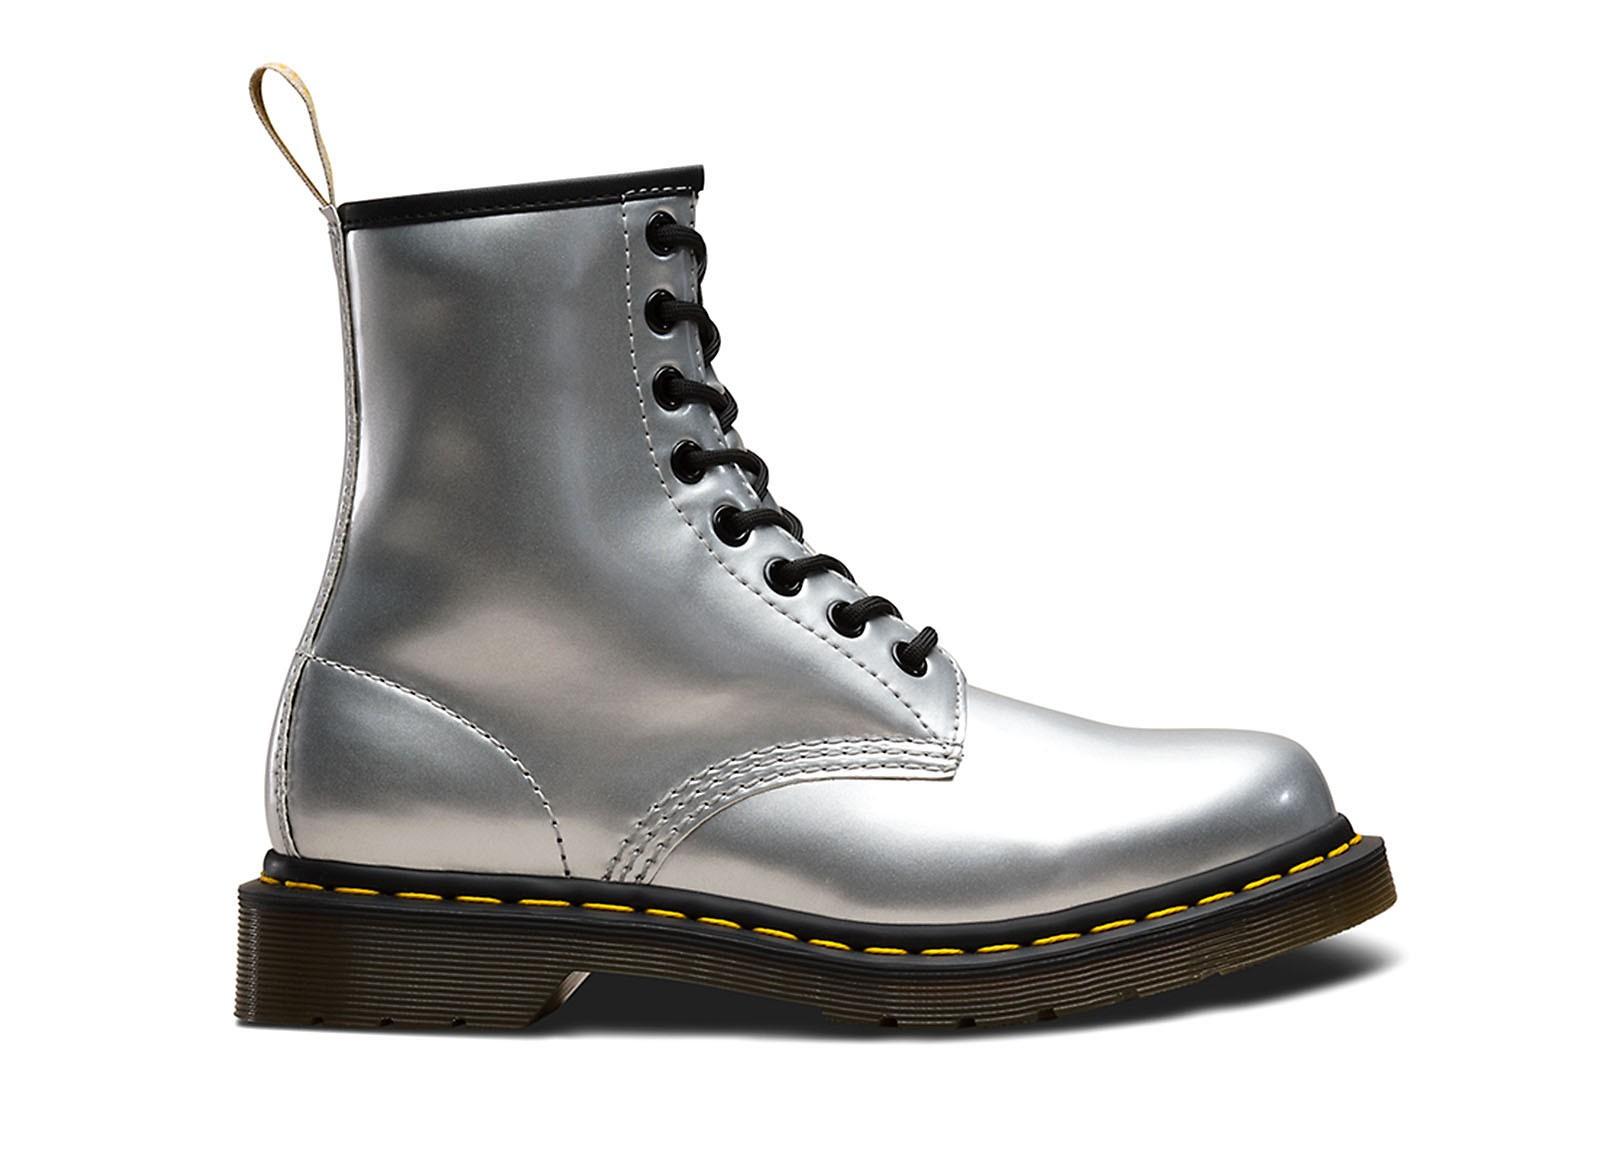 premium selection on wholesale multiple colors Vegan Boot | DR. MARTENS 1460 8-Eye Boot Chrome Paint Silver ...